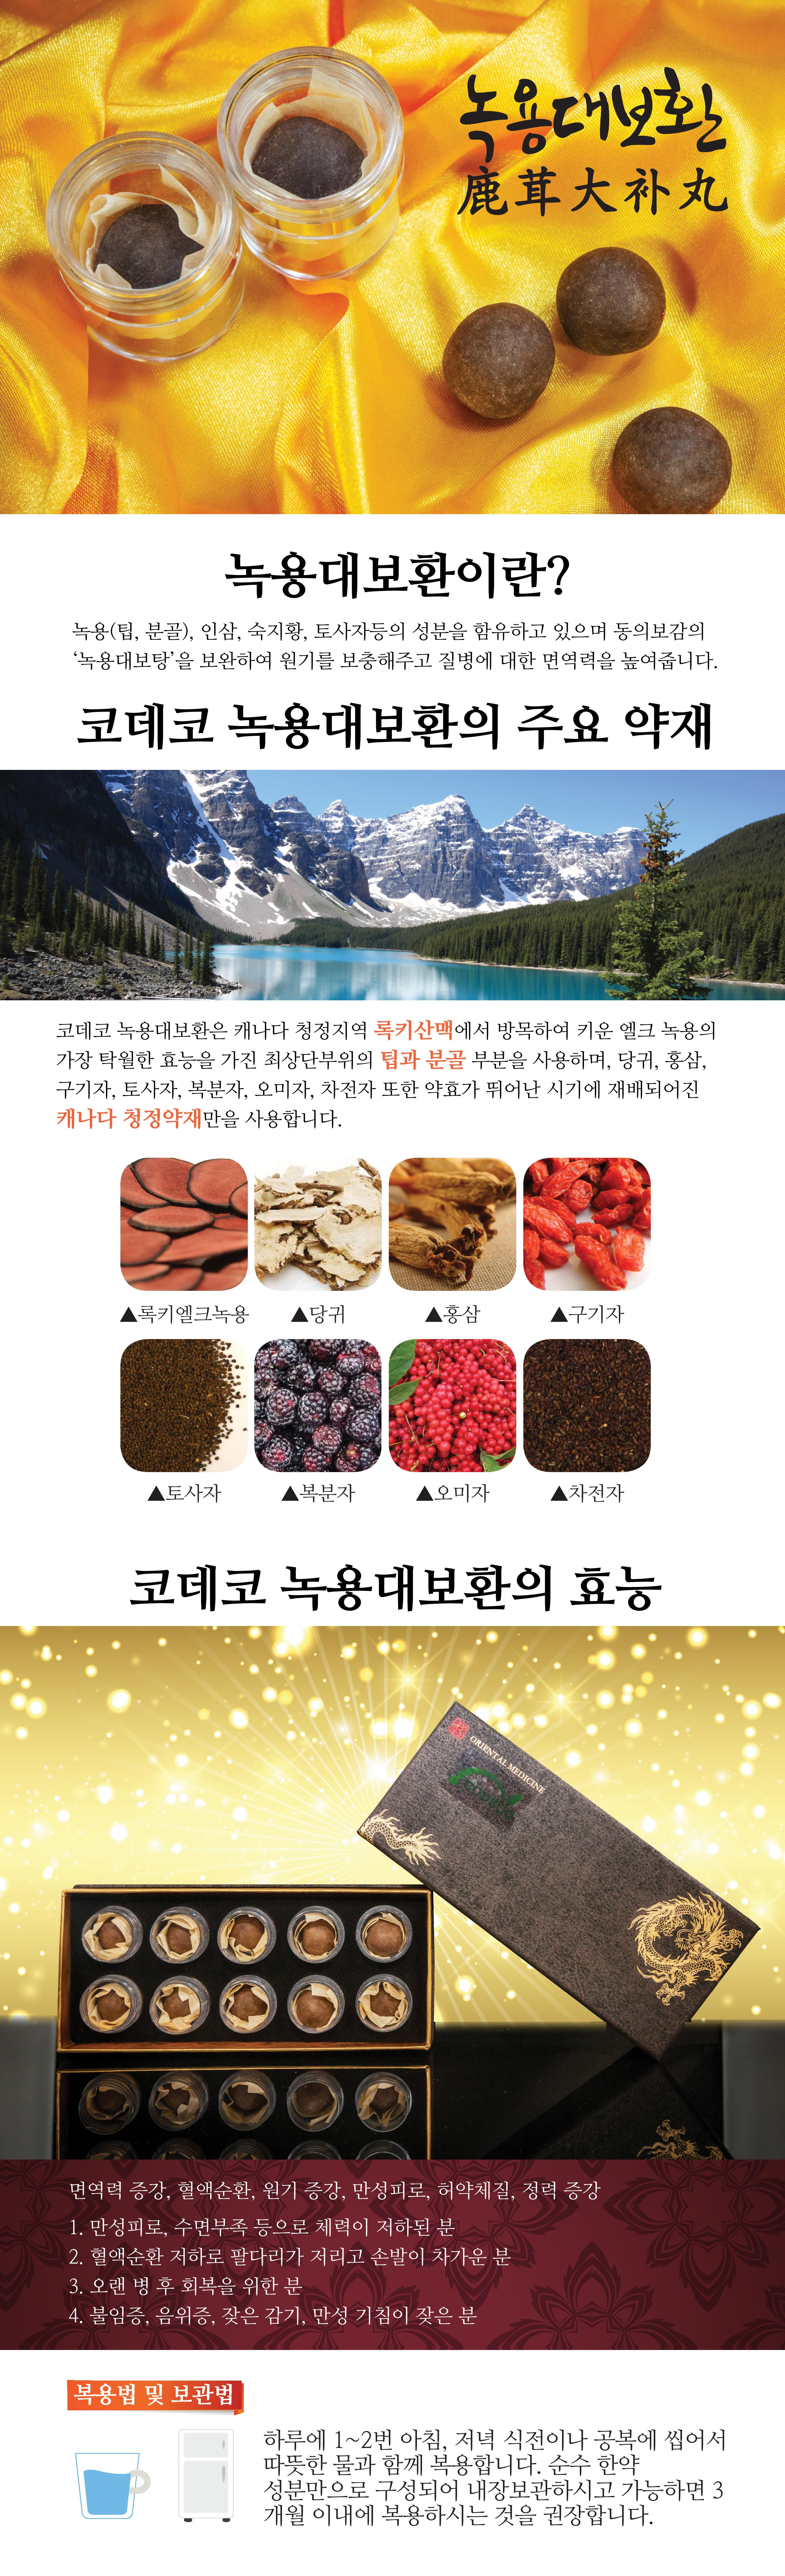 contents_대보환